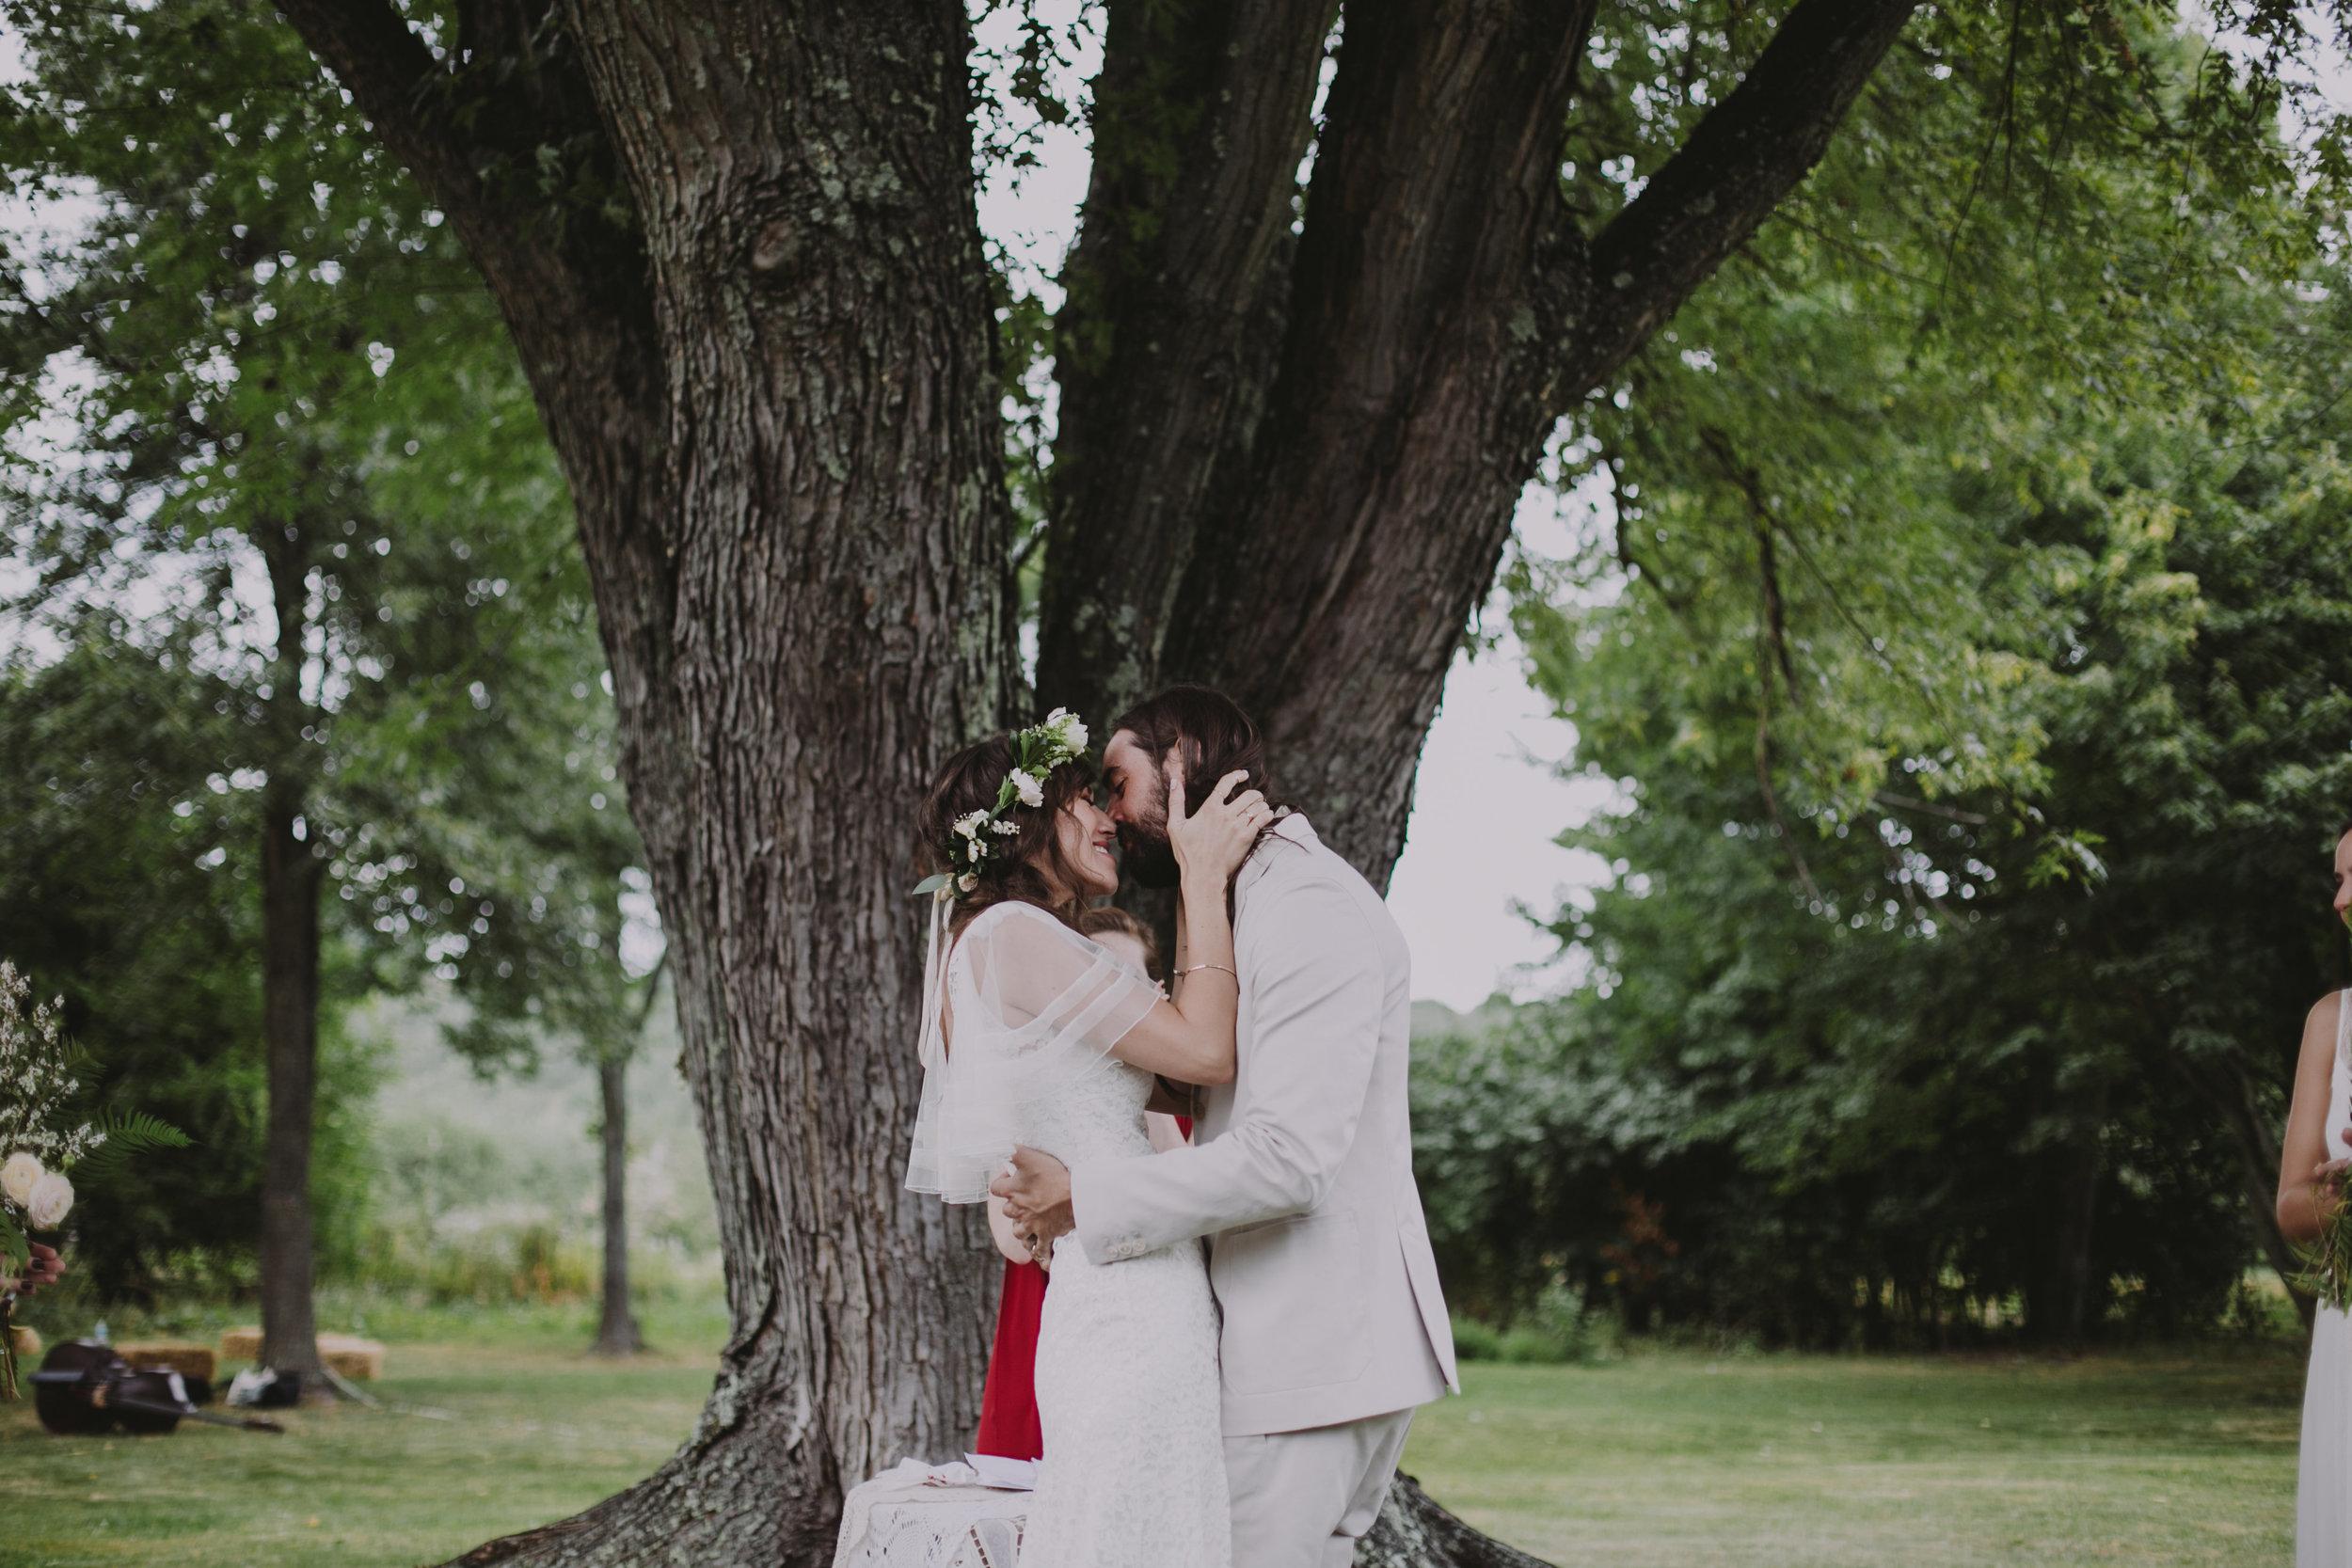 LIBERTY_VIEW_FARM_HIGHLAND_NY_WEDDING_CHELLISE_MICHAEL_PHOTOGRAPHY840.JPG